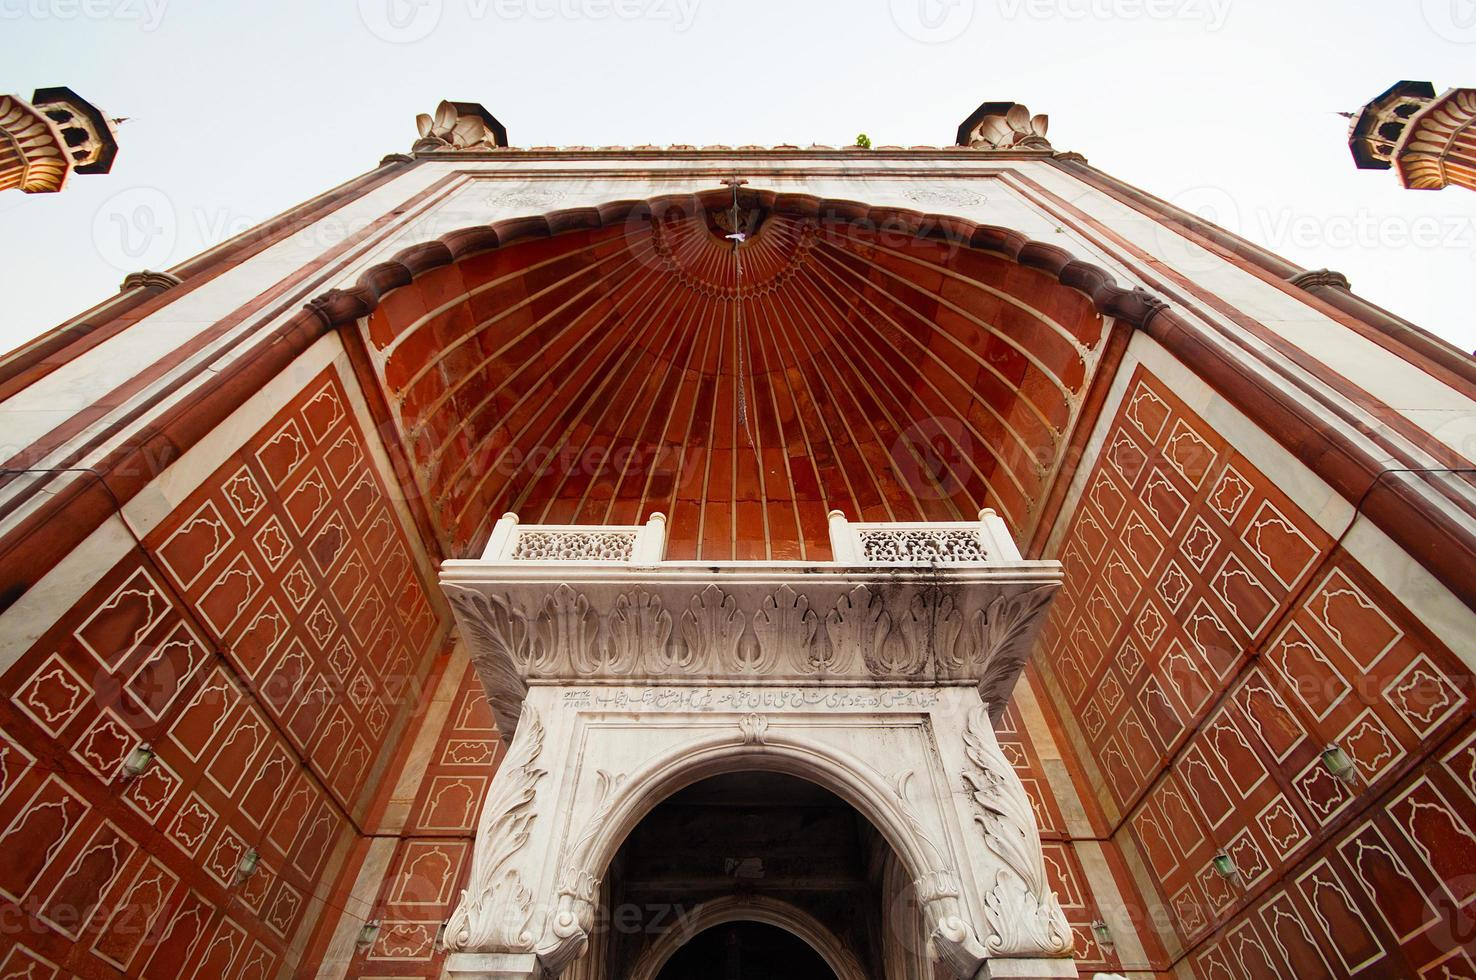 moschea jama masjid, vecchia delhi, india foto